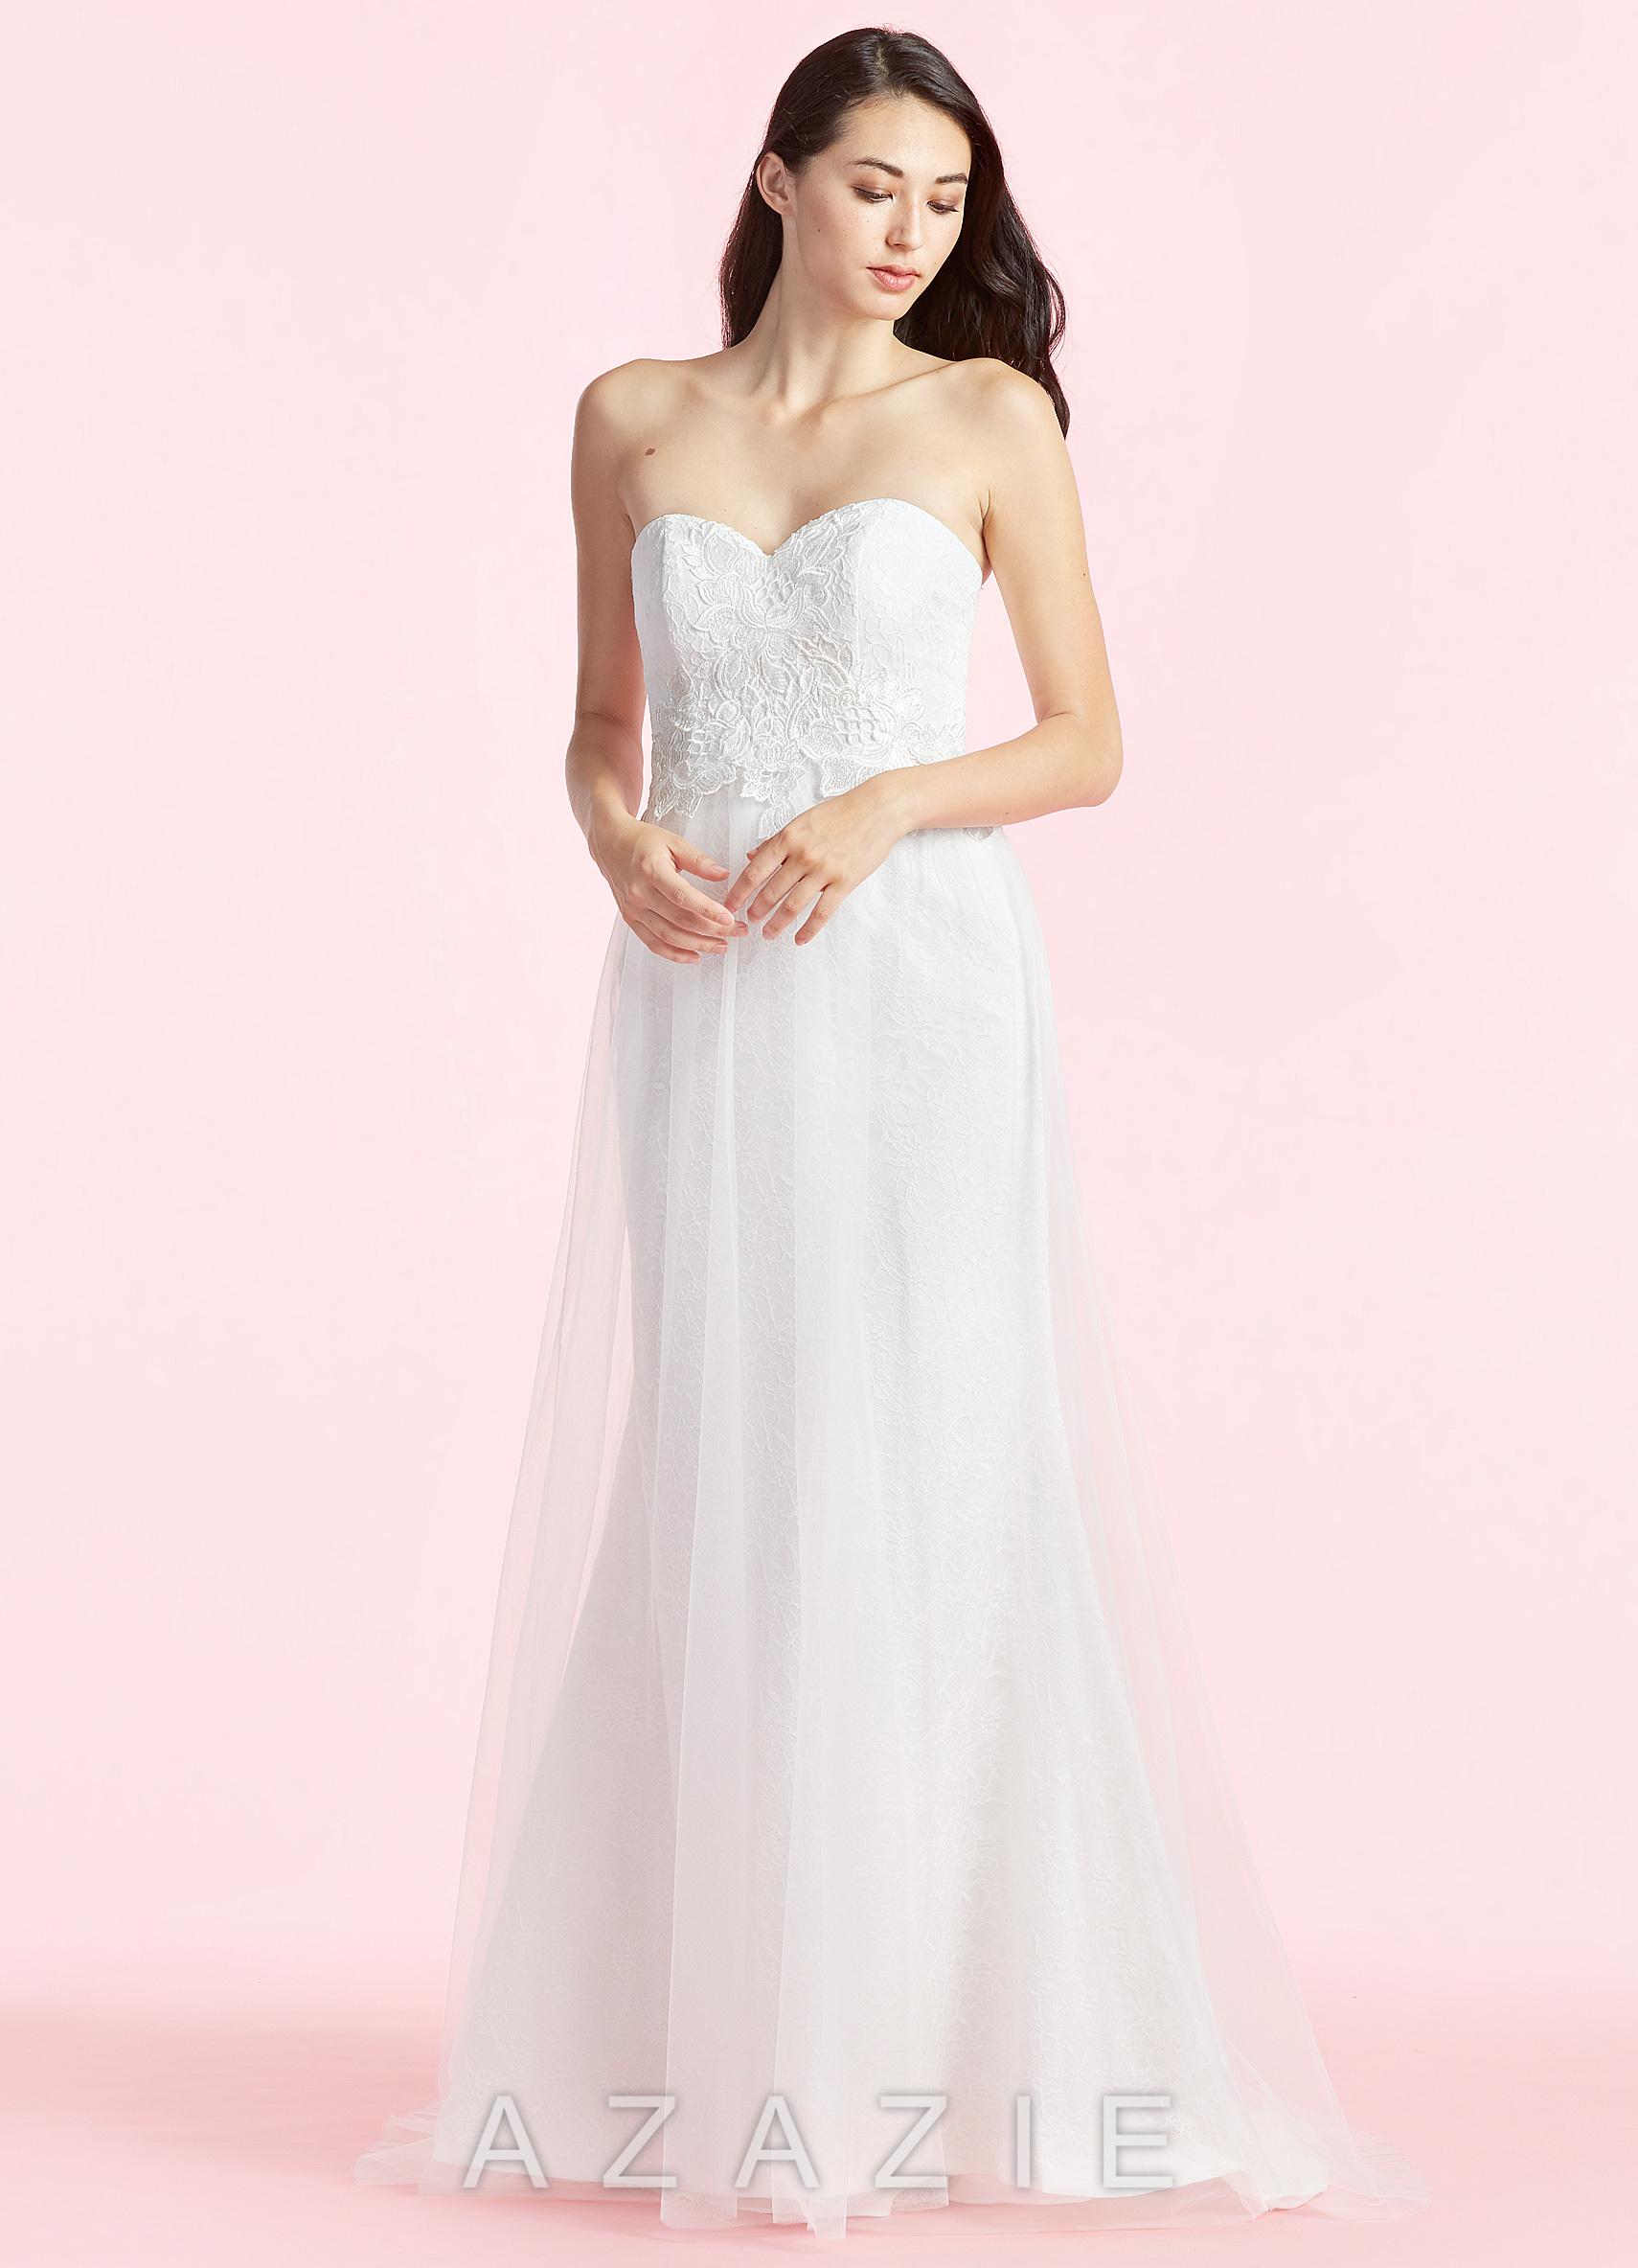 Maria nedkova wedding dress hire uk